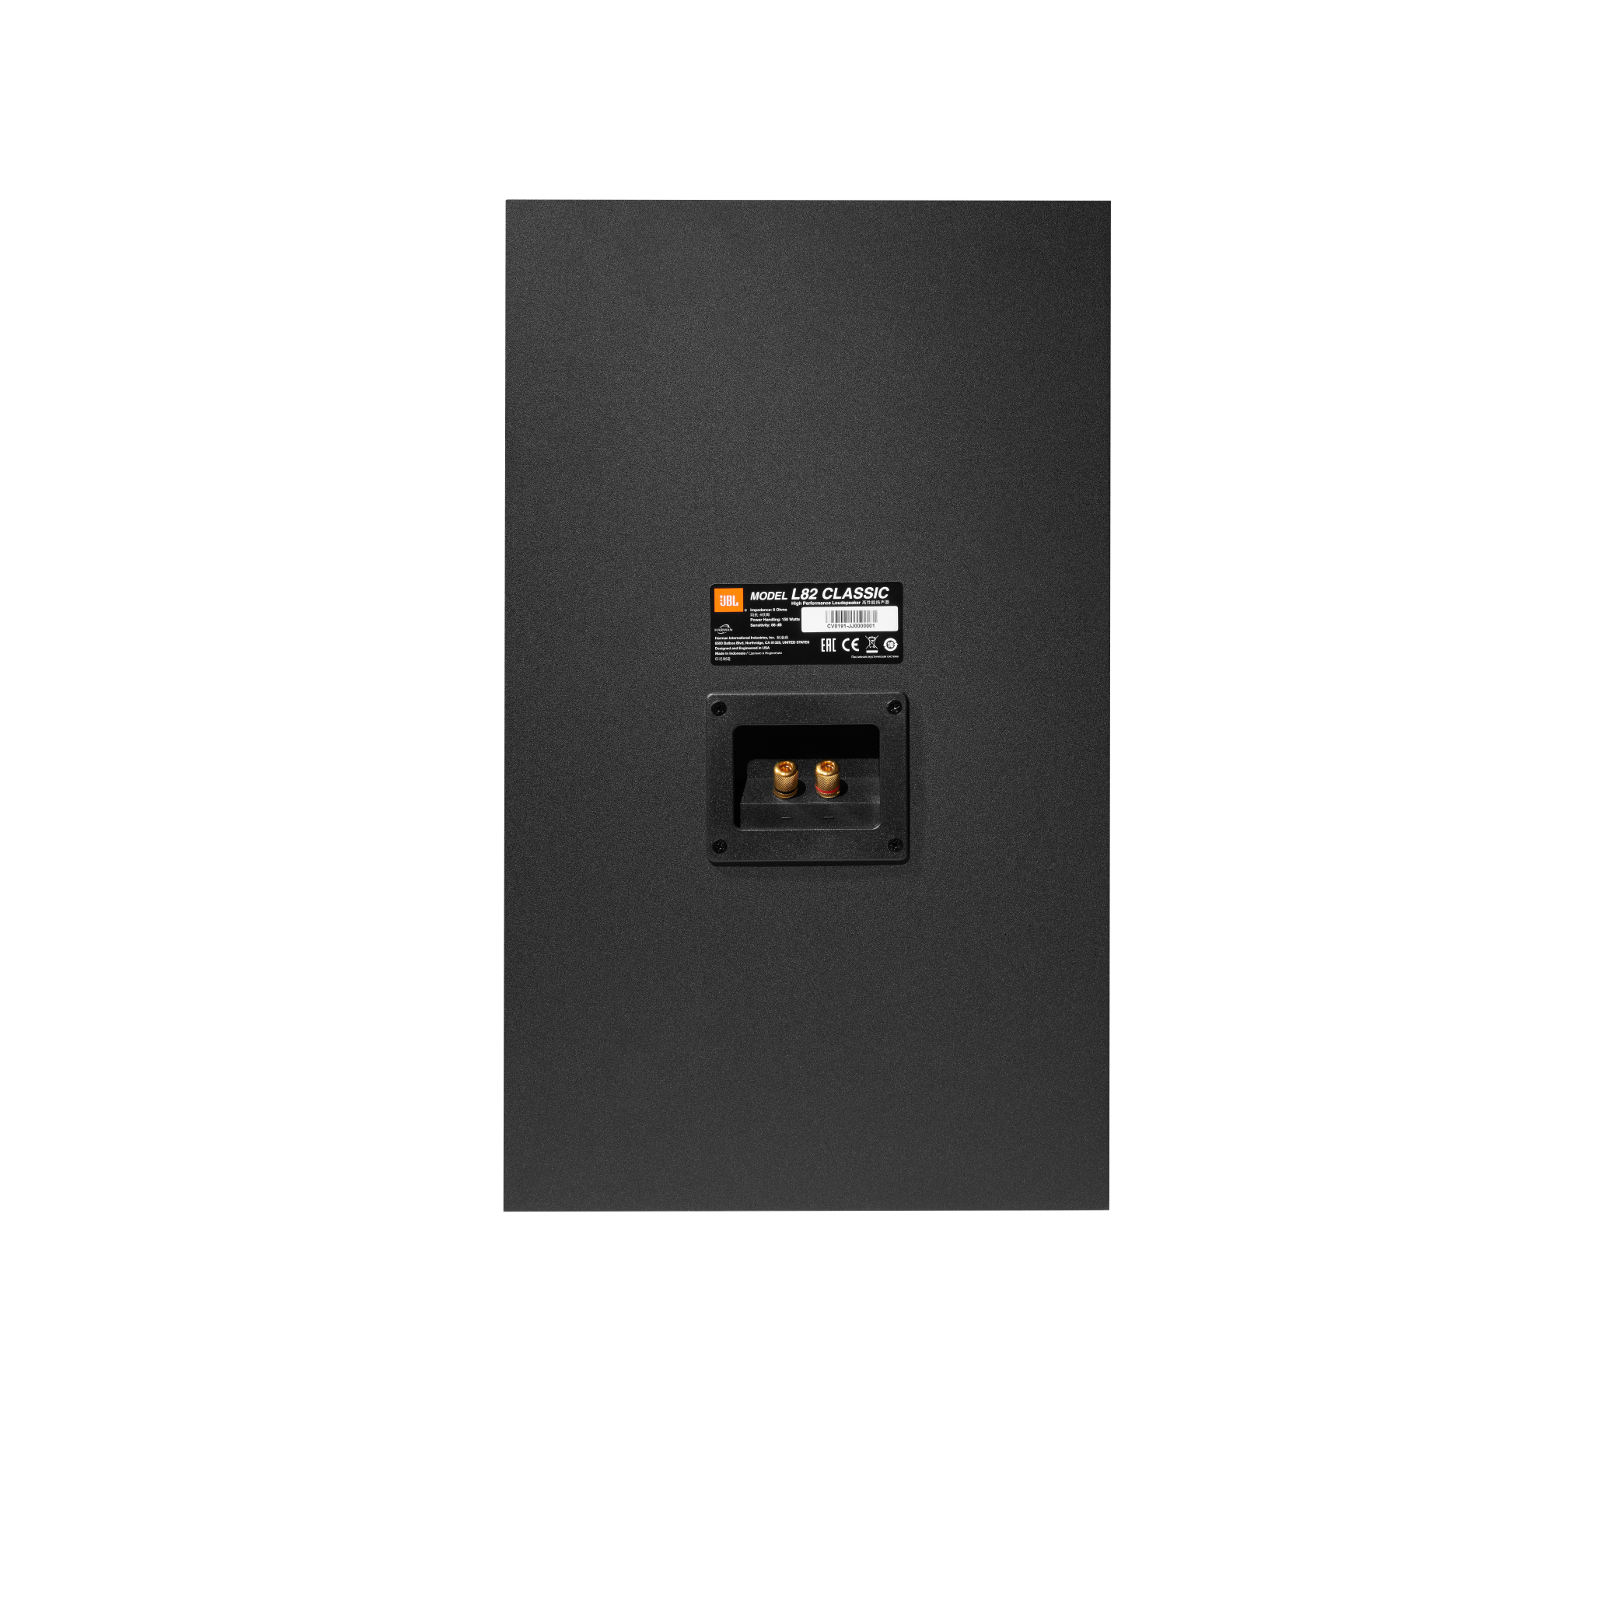 L82 Classic - Black - 2-way 8-inch (200mm) Bookshelf Loudspeaker - Back